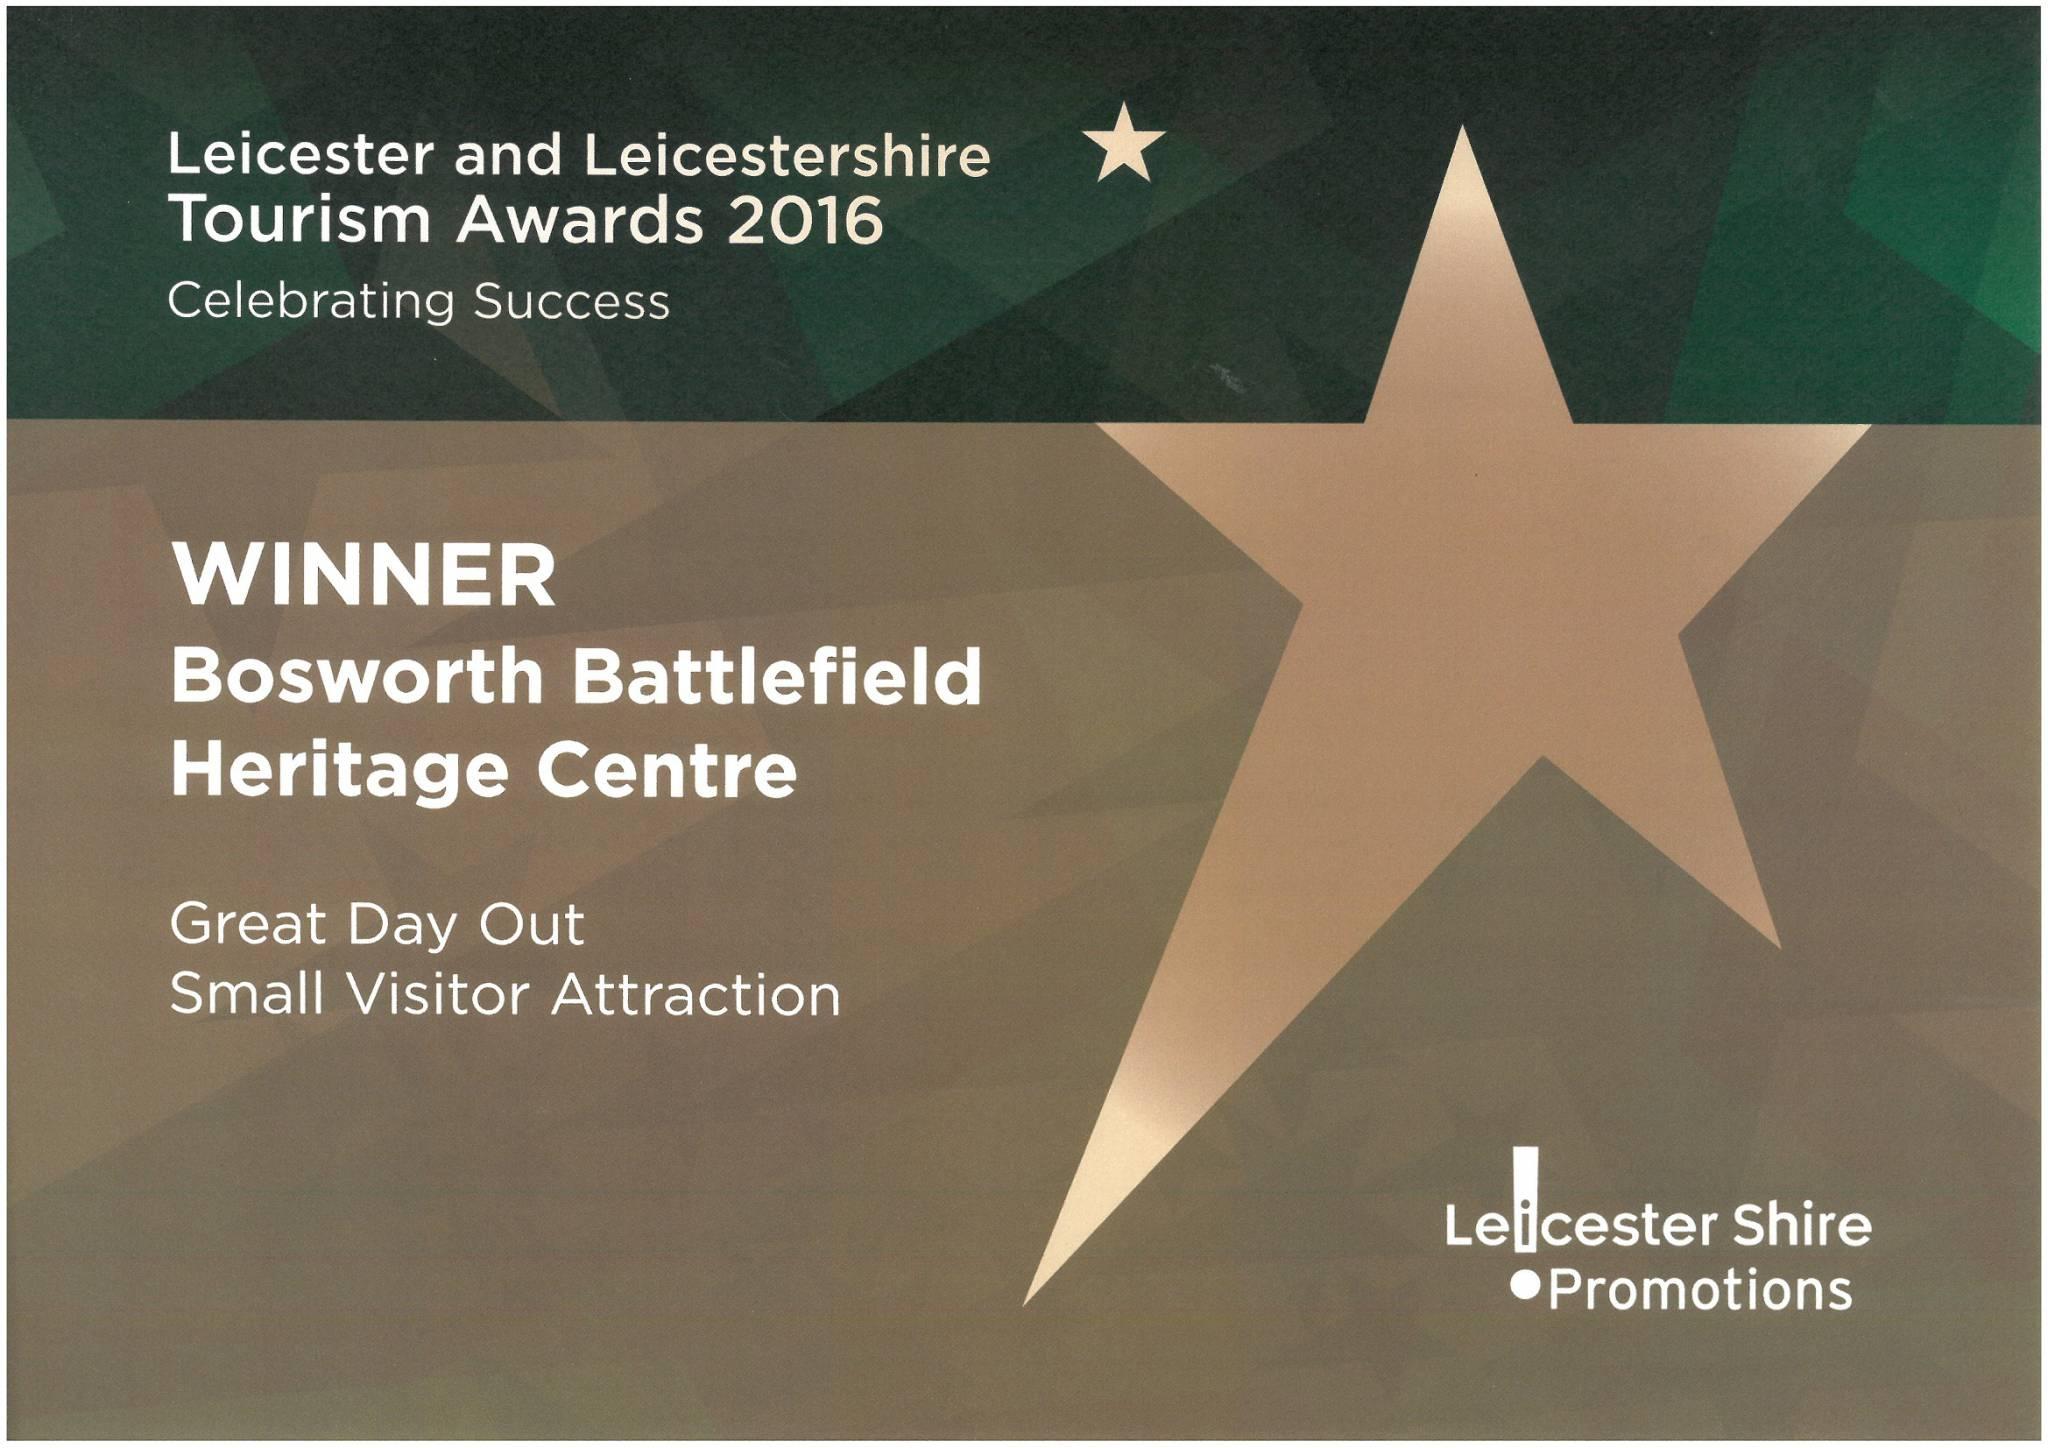 Bosworth Battlefield Exhibition Re-opens